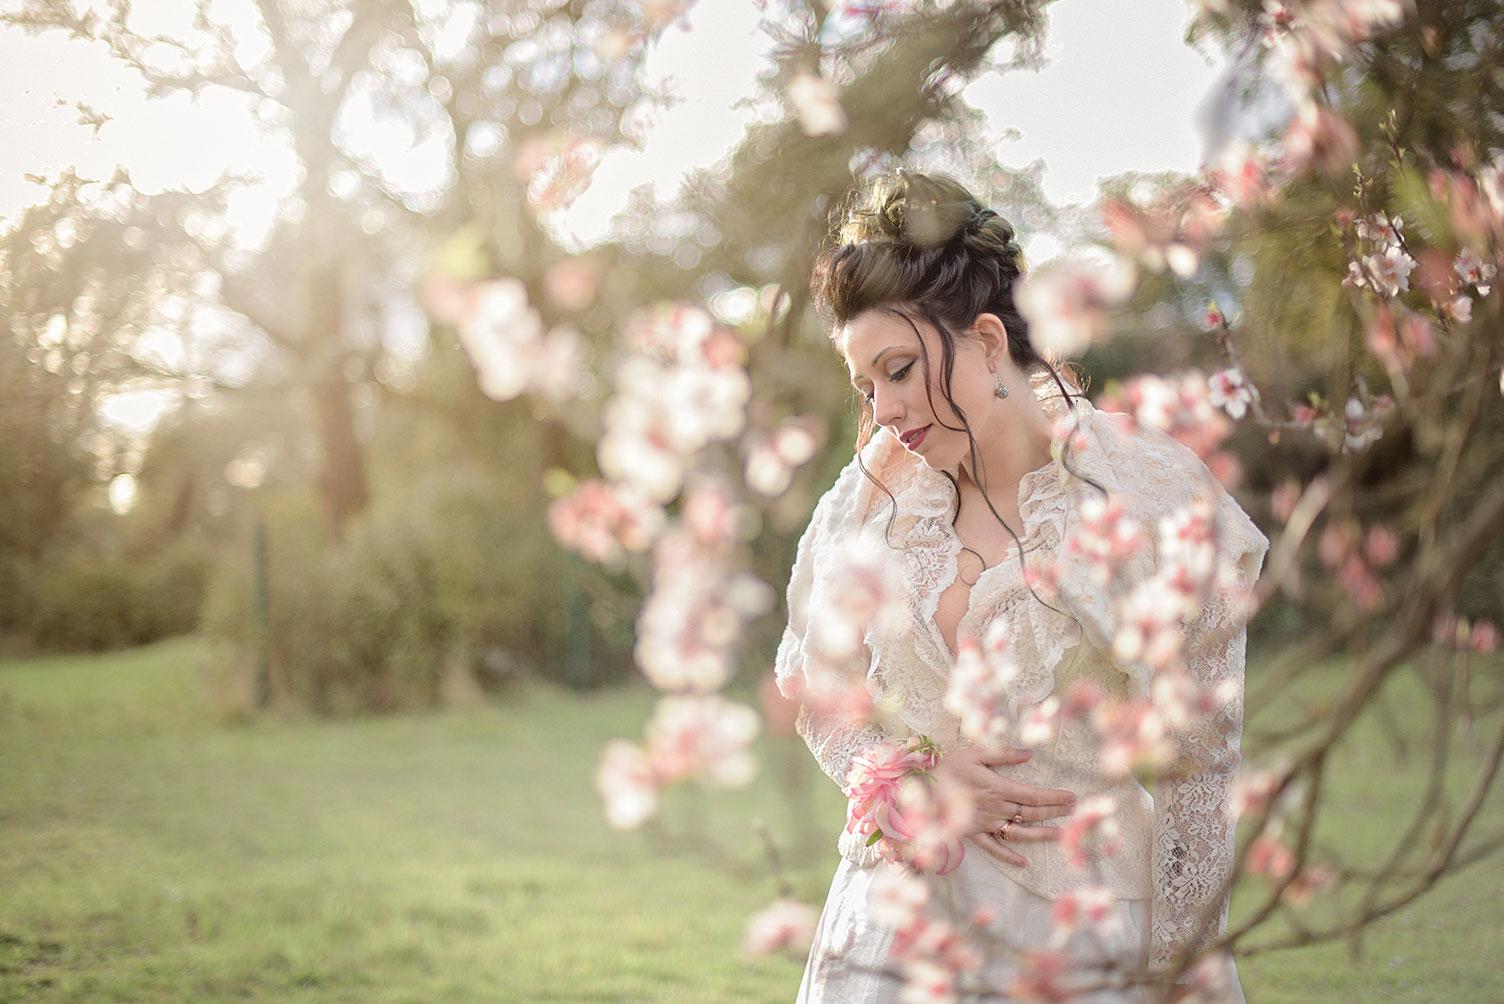 meilleur-photographe-mariage-montpellier1